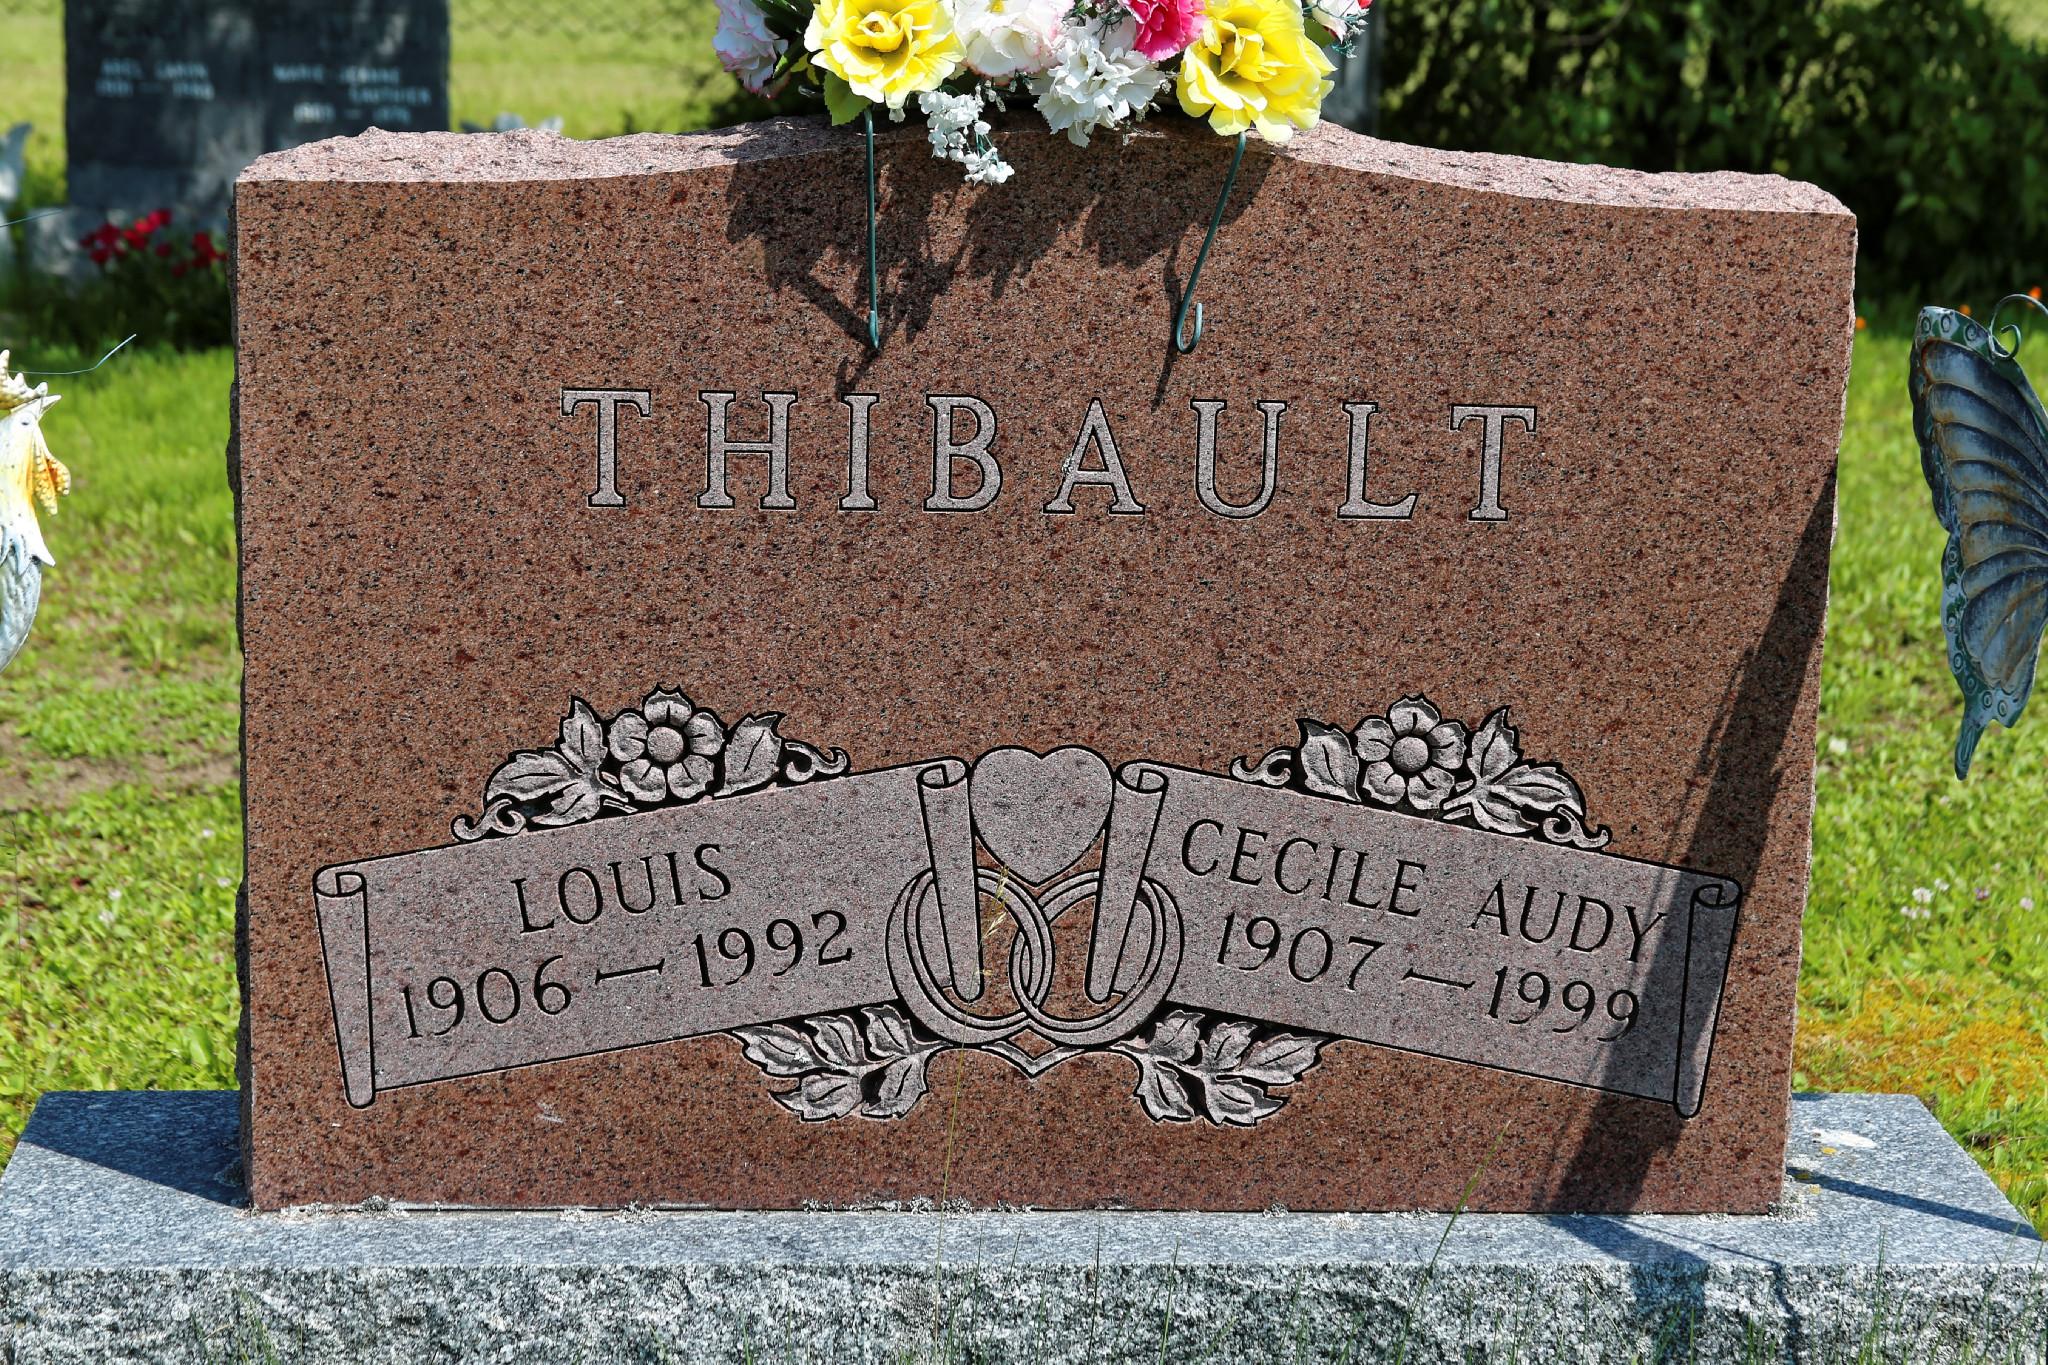 Louis Thibault